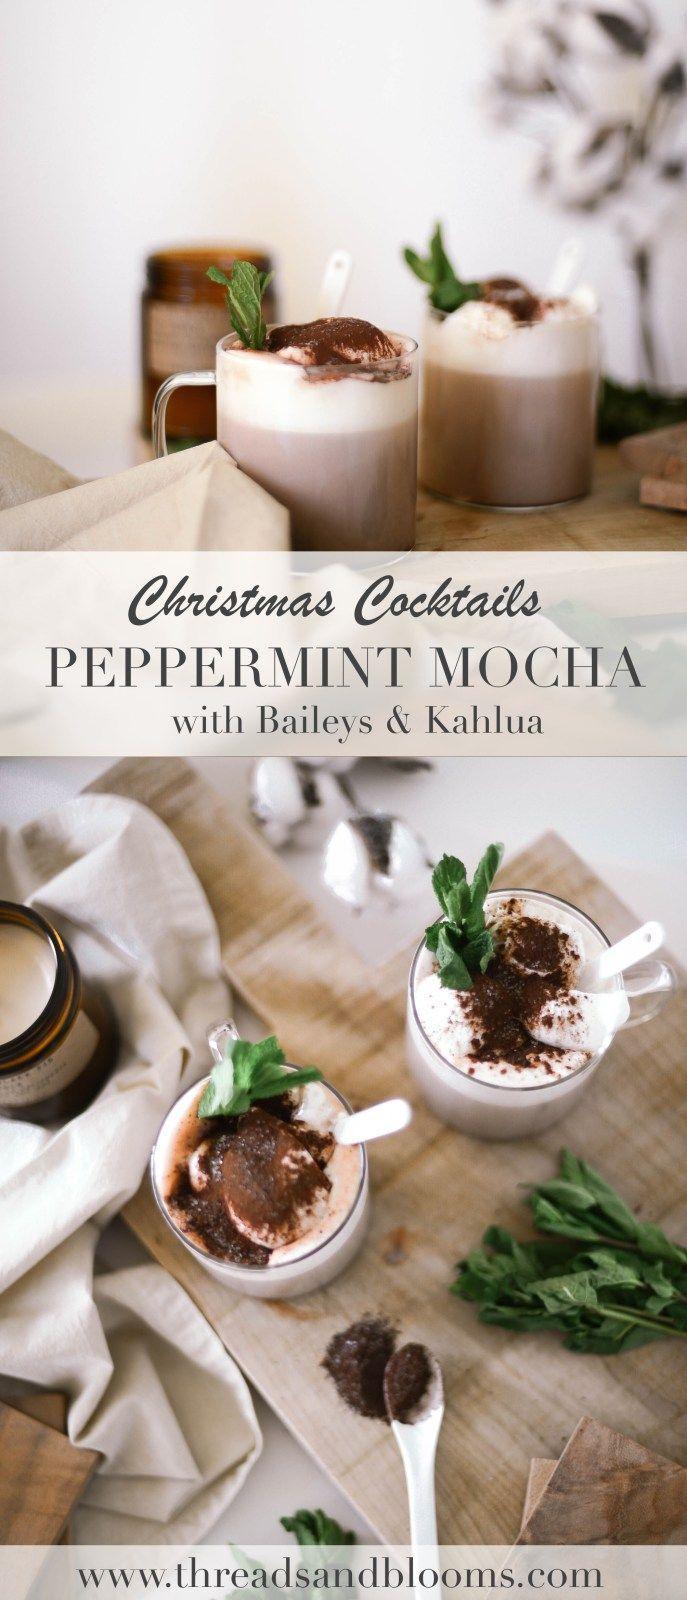 Christmas Cocktails Peppermint Mocha With Kahlua And Baileys Weihnachtscocktails Lebensmittel Essen Pfefferminze